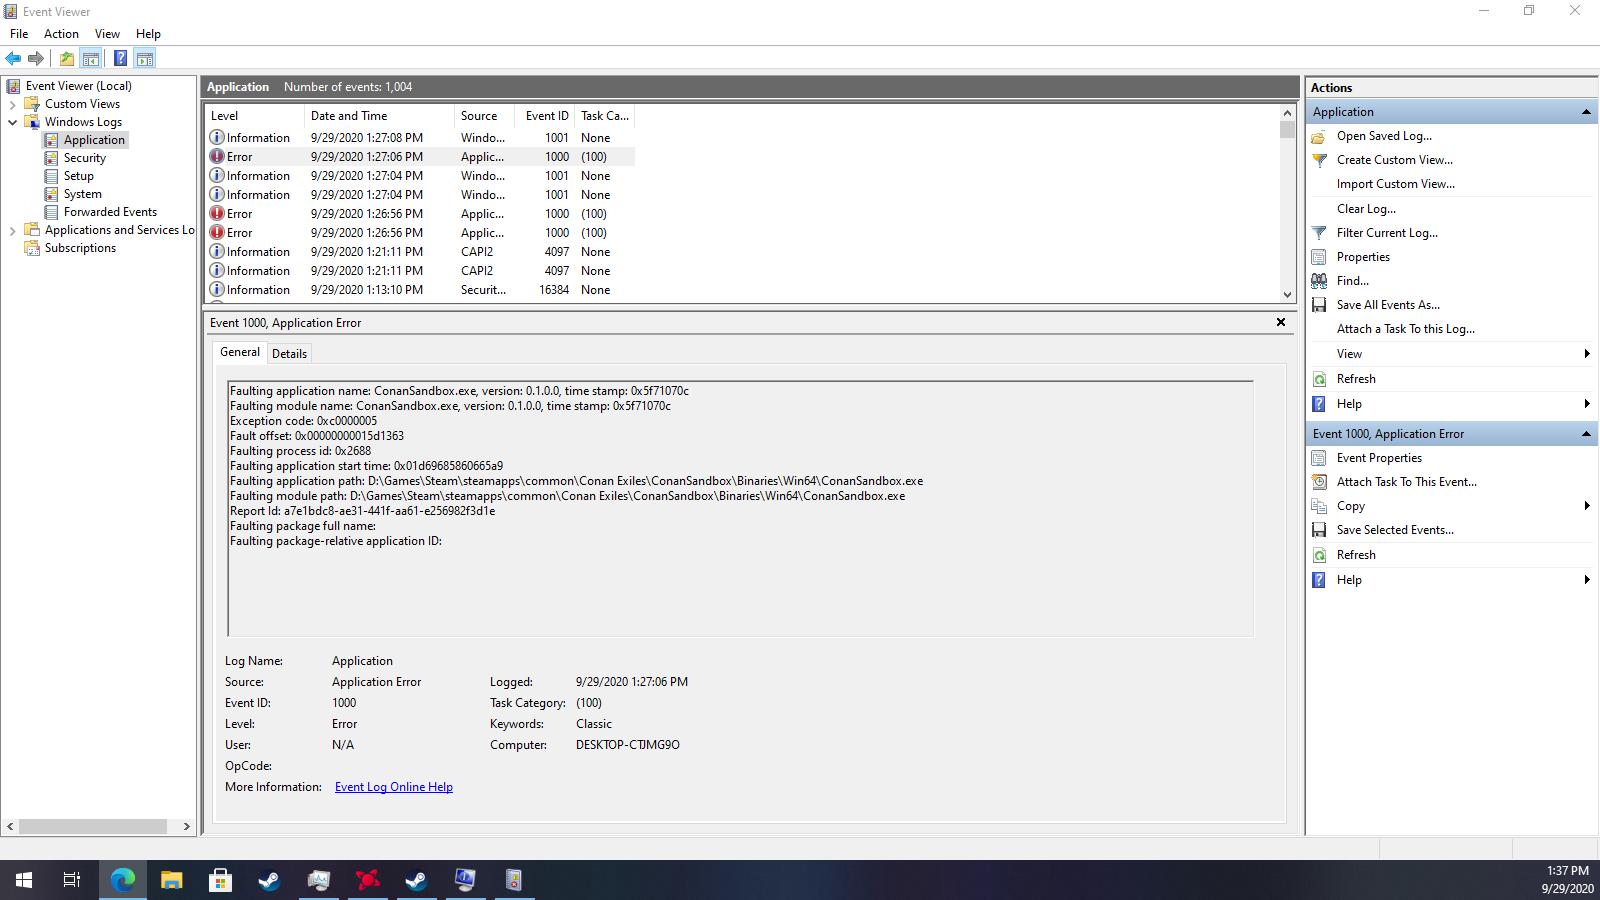 Window 10 Pro task manager suspending games. 24d908d1-dfa5-44f2-85c4-4510d05a756e?upload=true.png